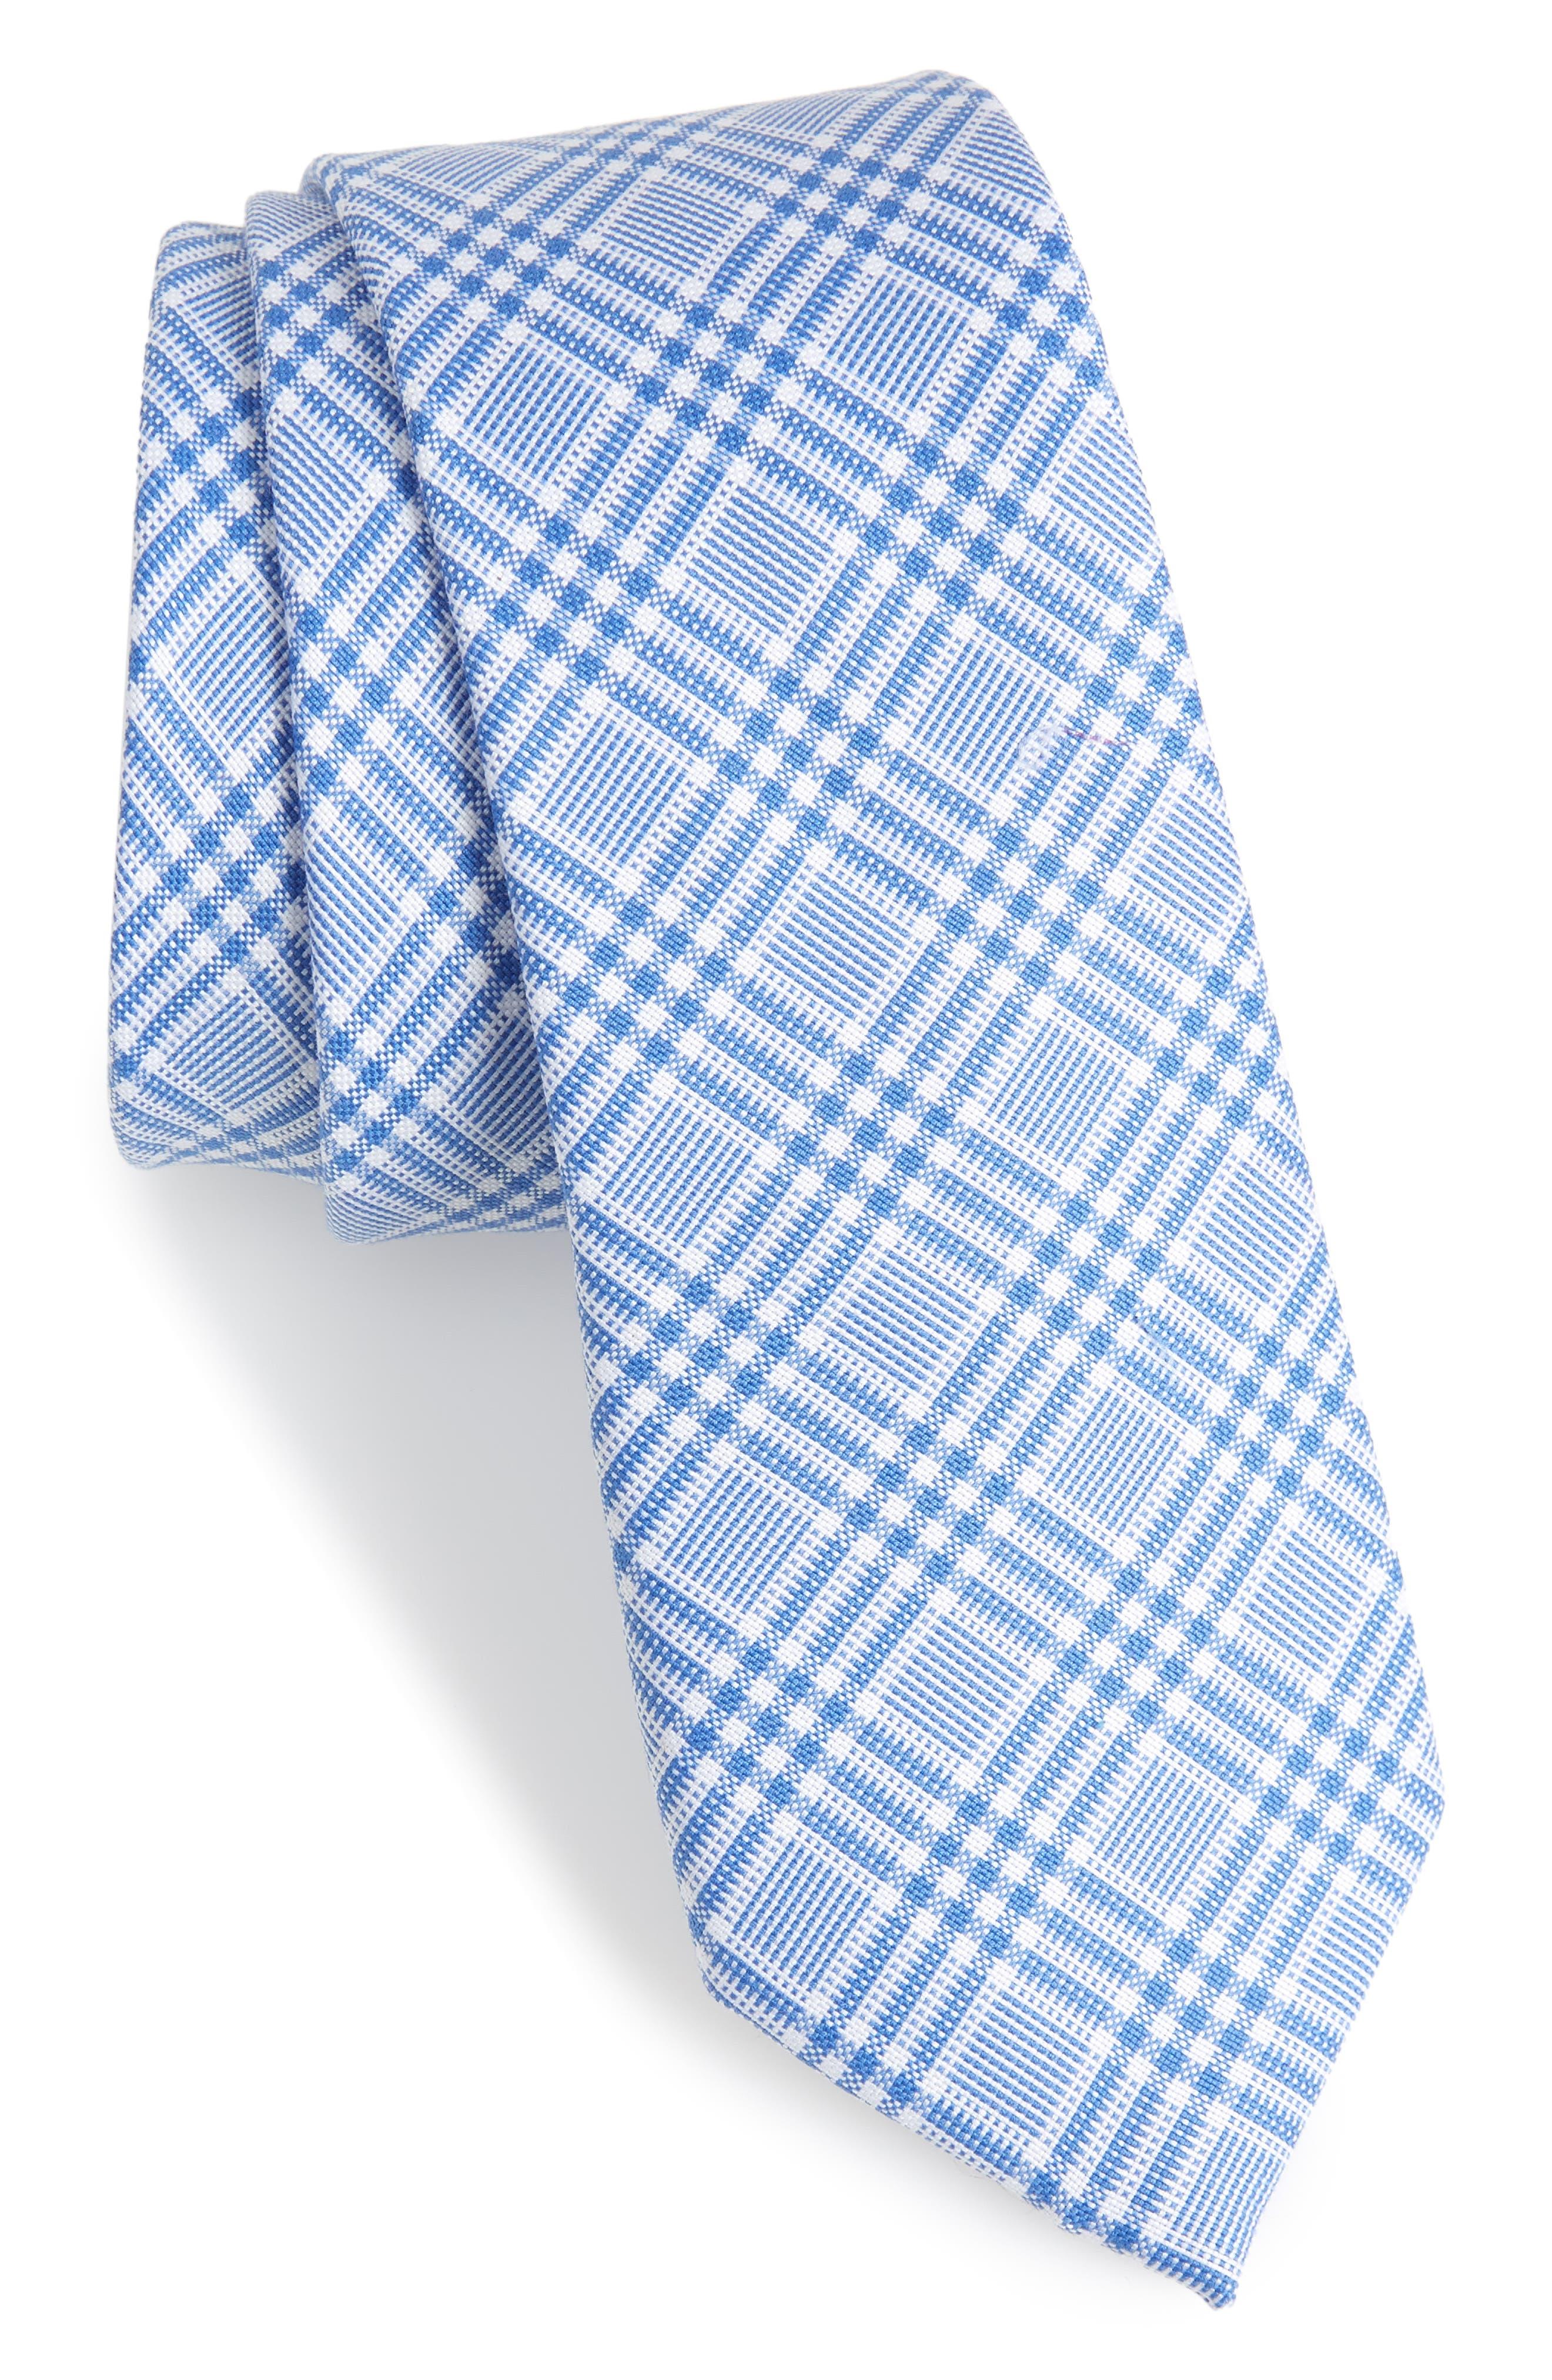 Brook Plaid Cotton Skinny Tie,                         Main,                         color,